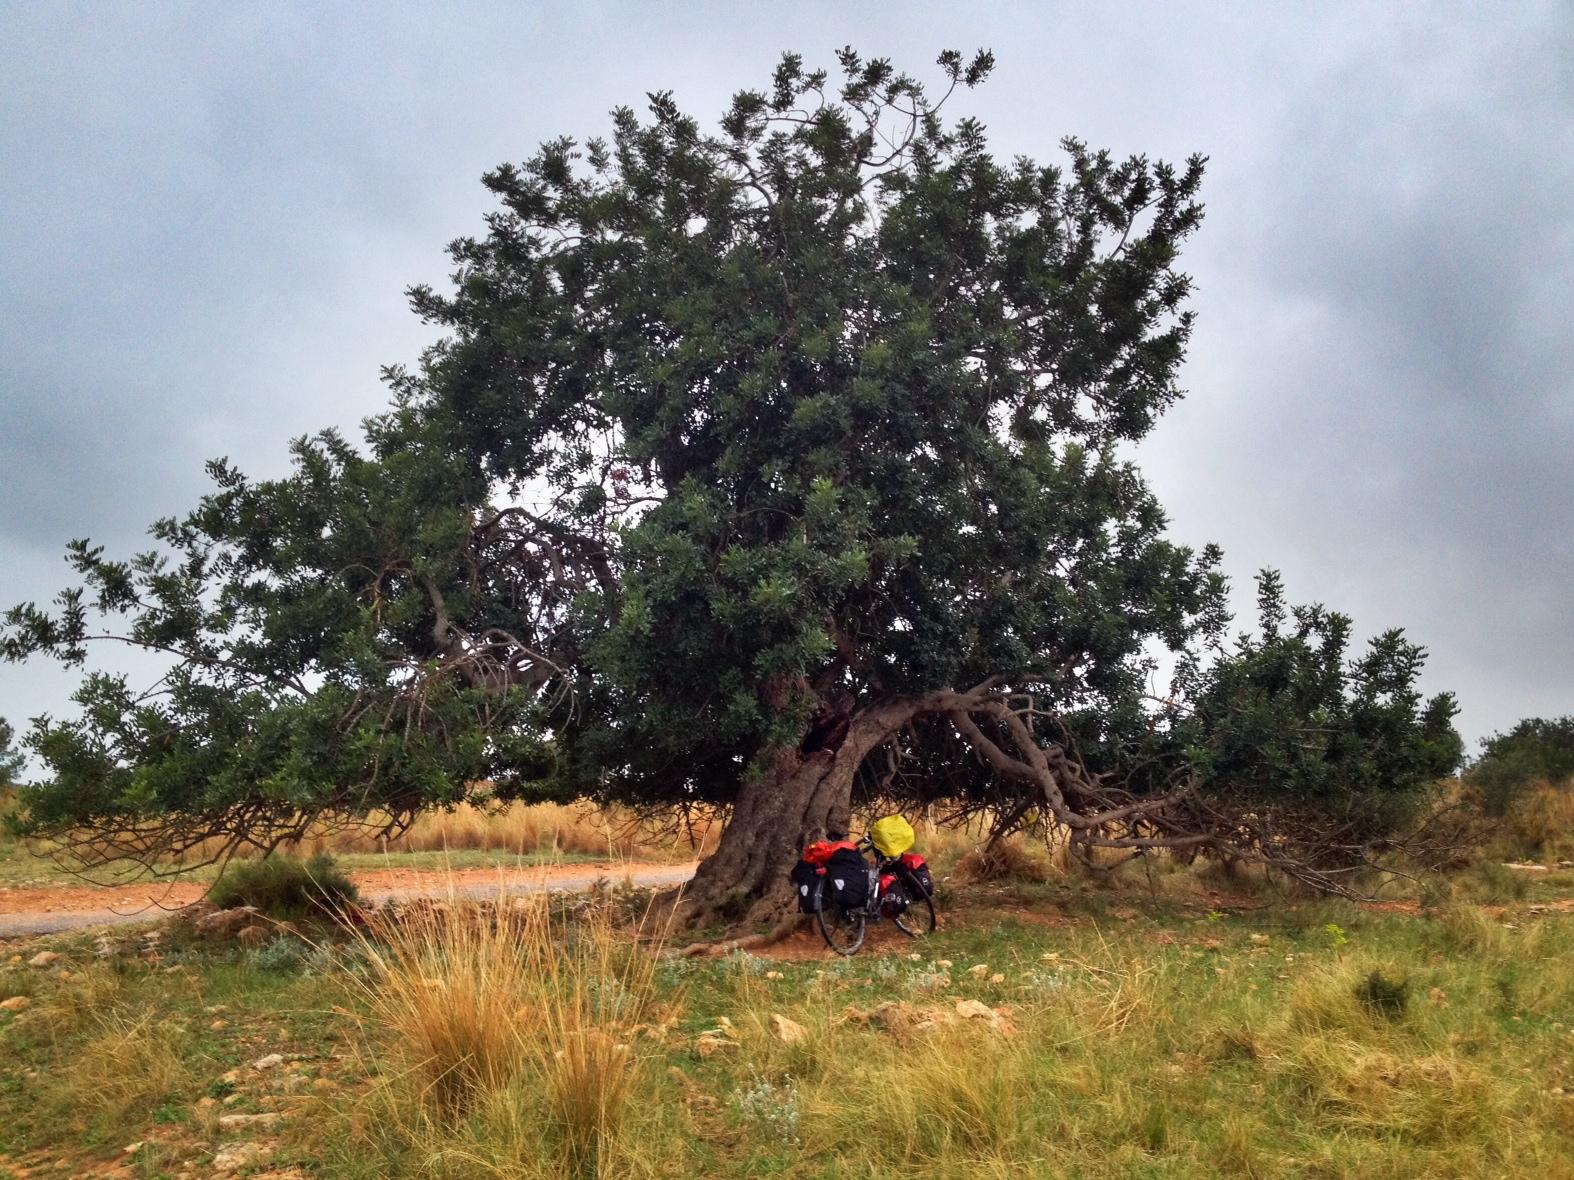 UntermOlivenbaum